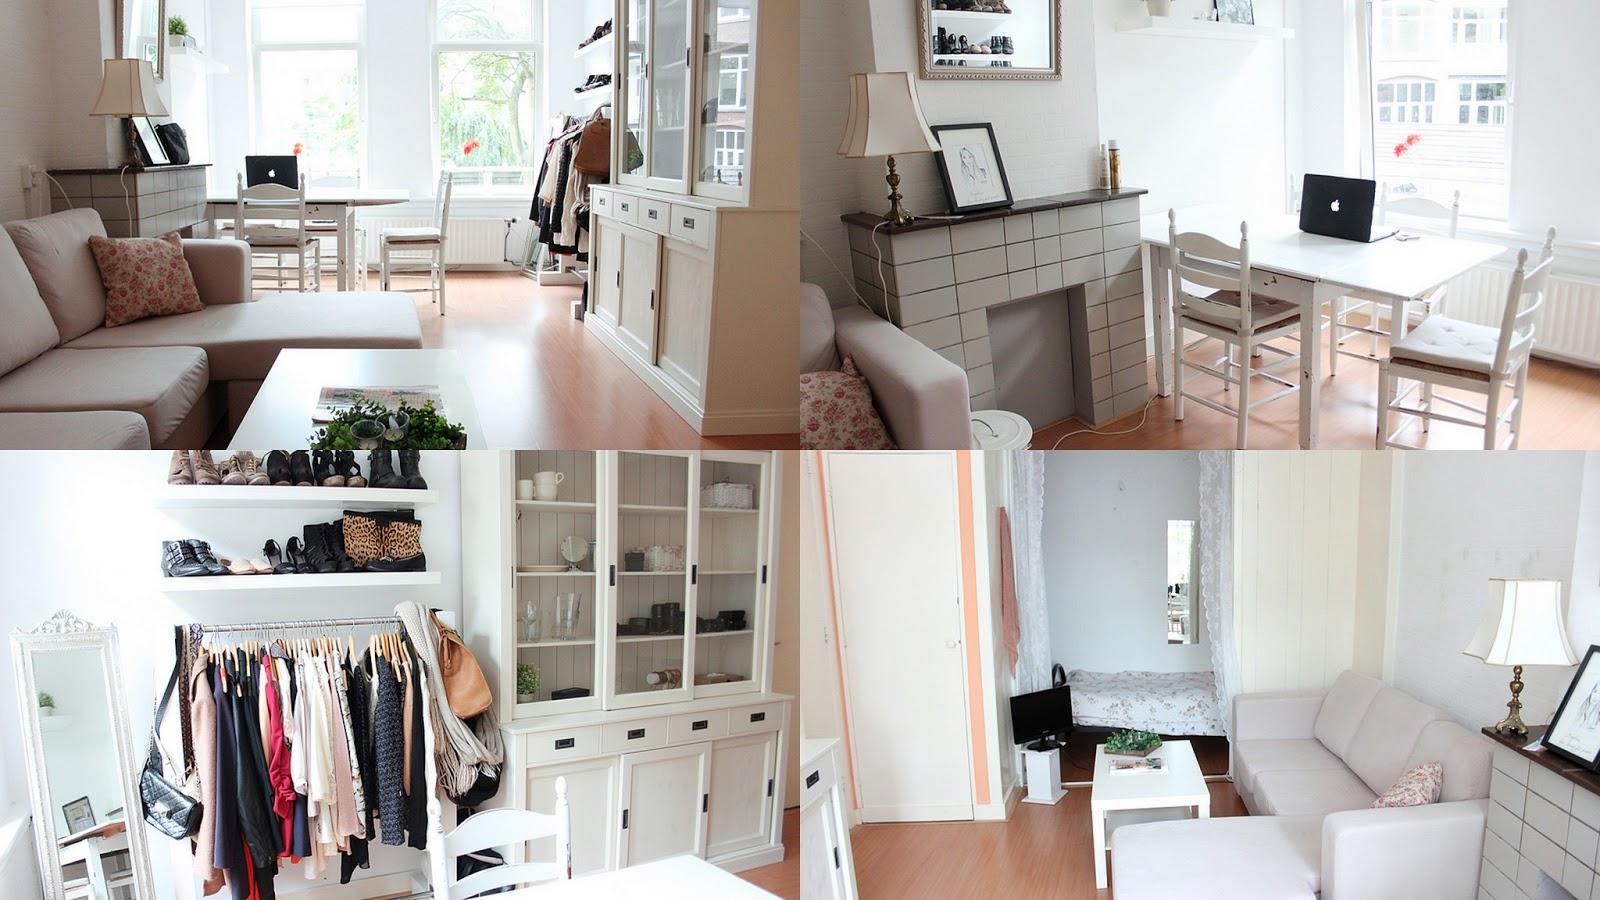 Diy slaapkamer idee - Slaapkamer idee ...